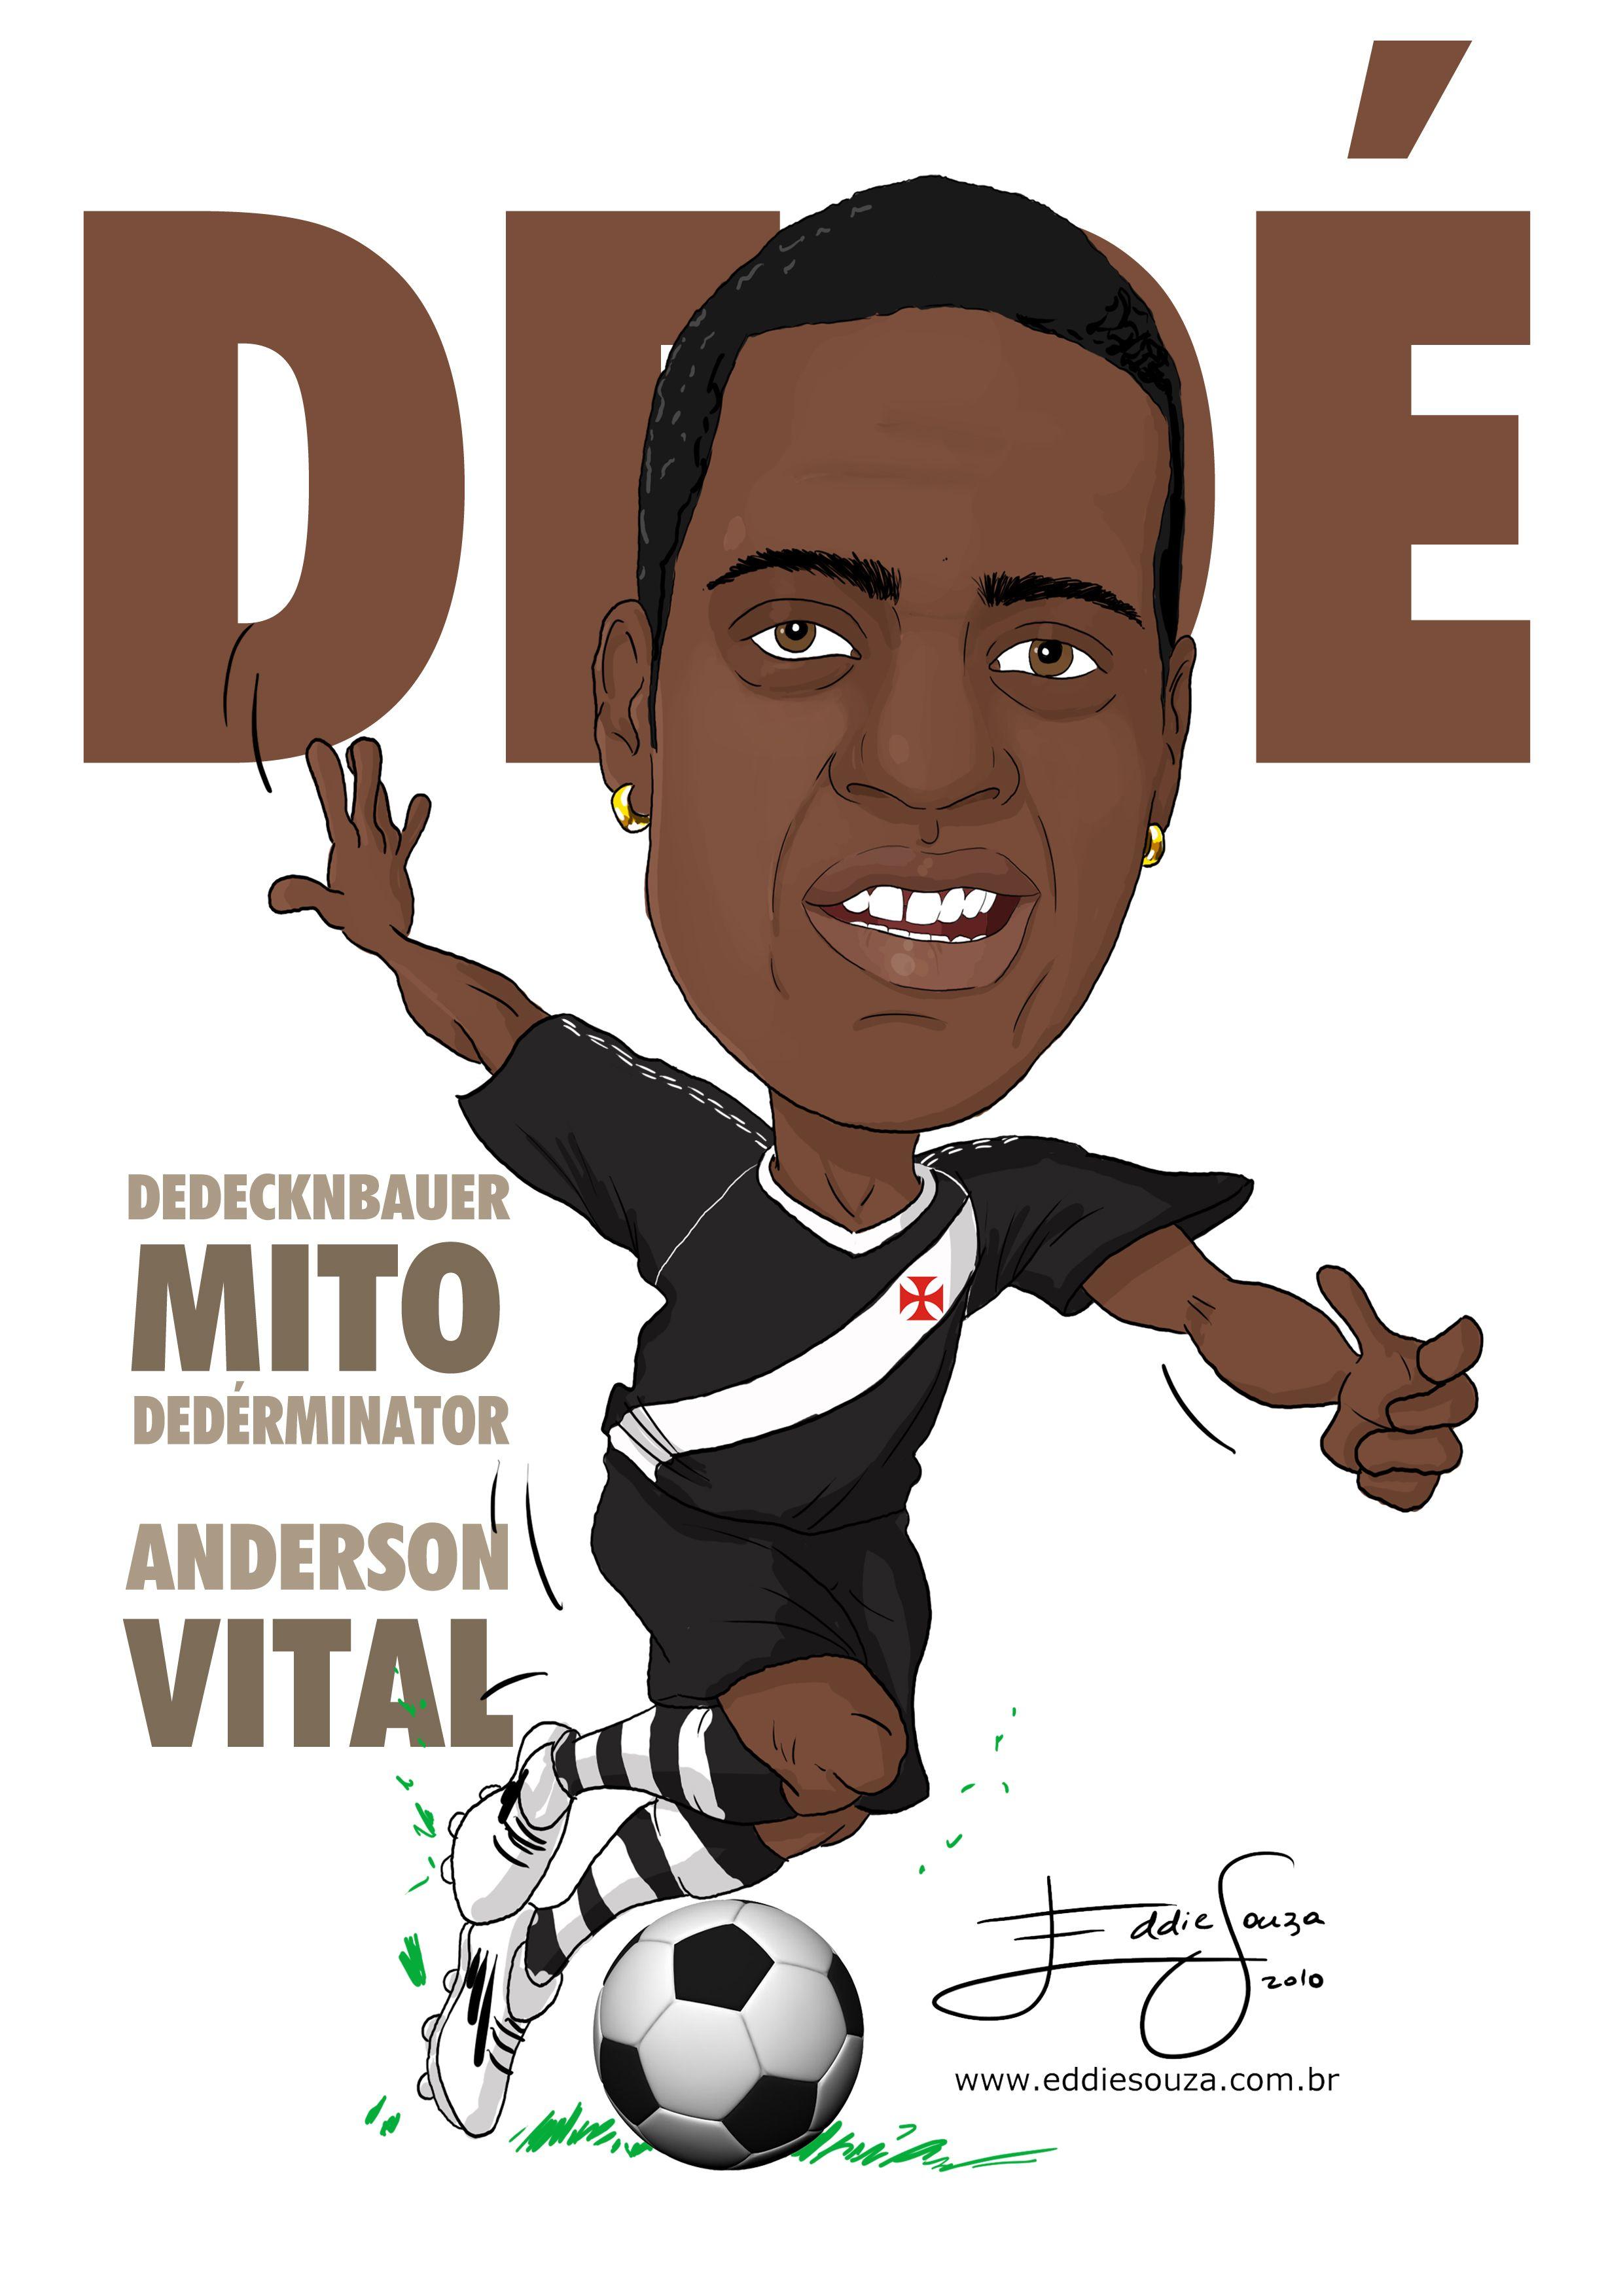 Dede Caricatura Eddie Souza Caricatura Vasco Da Gama Desenho